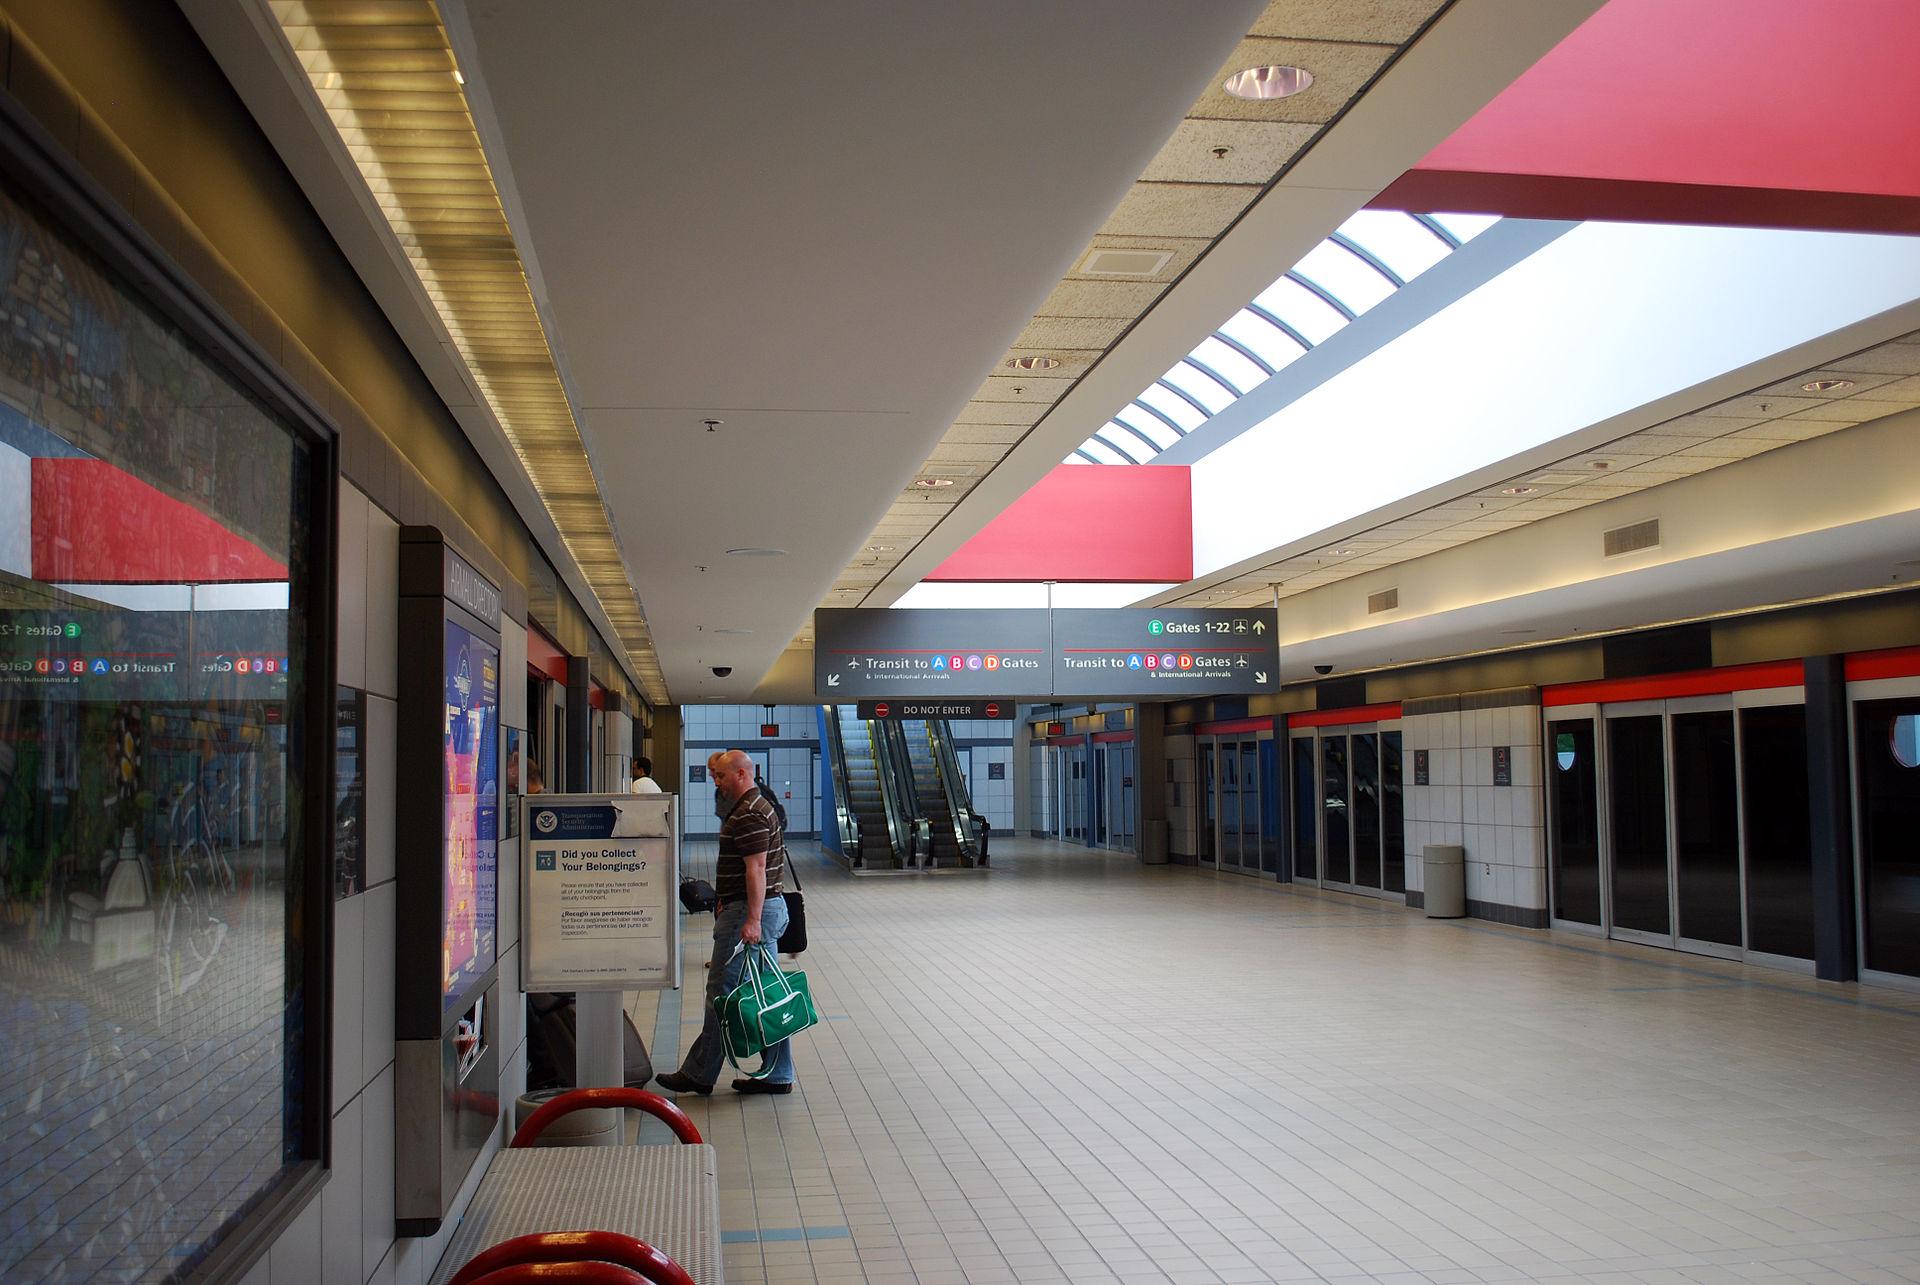 Pittsburgh International Airport People Movers - Wikipedia